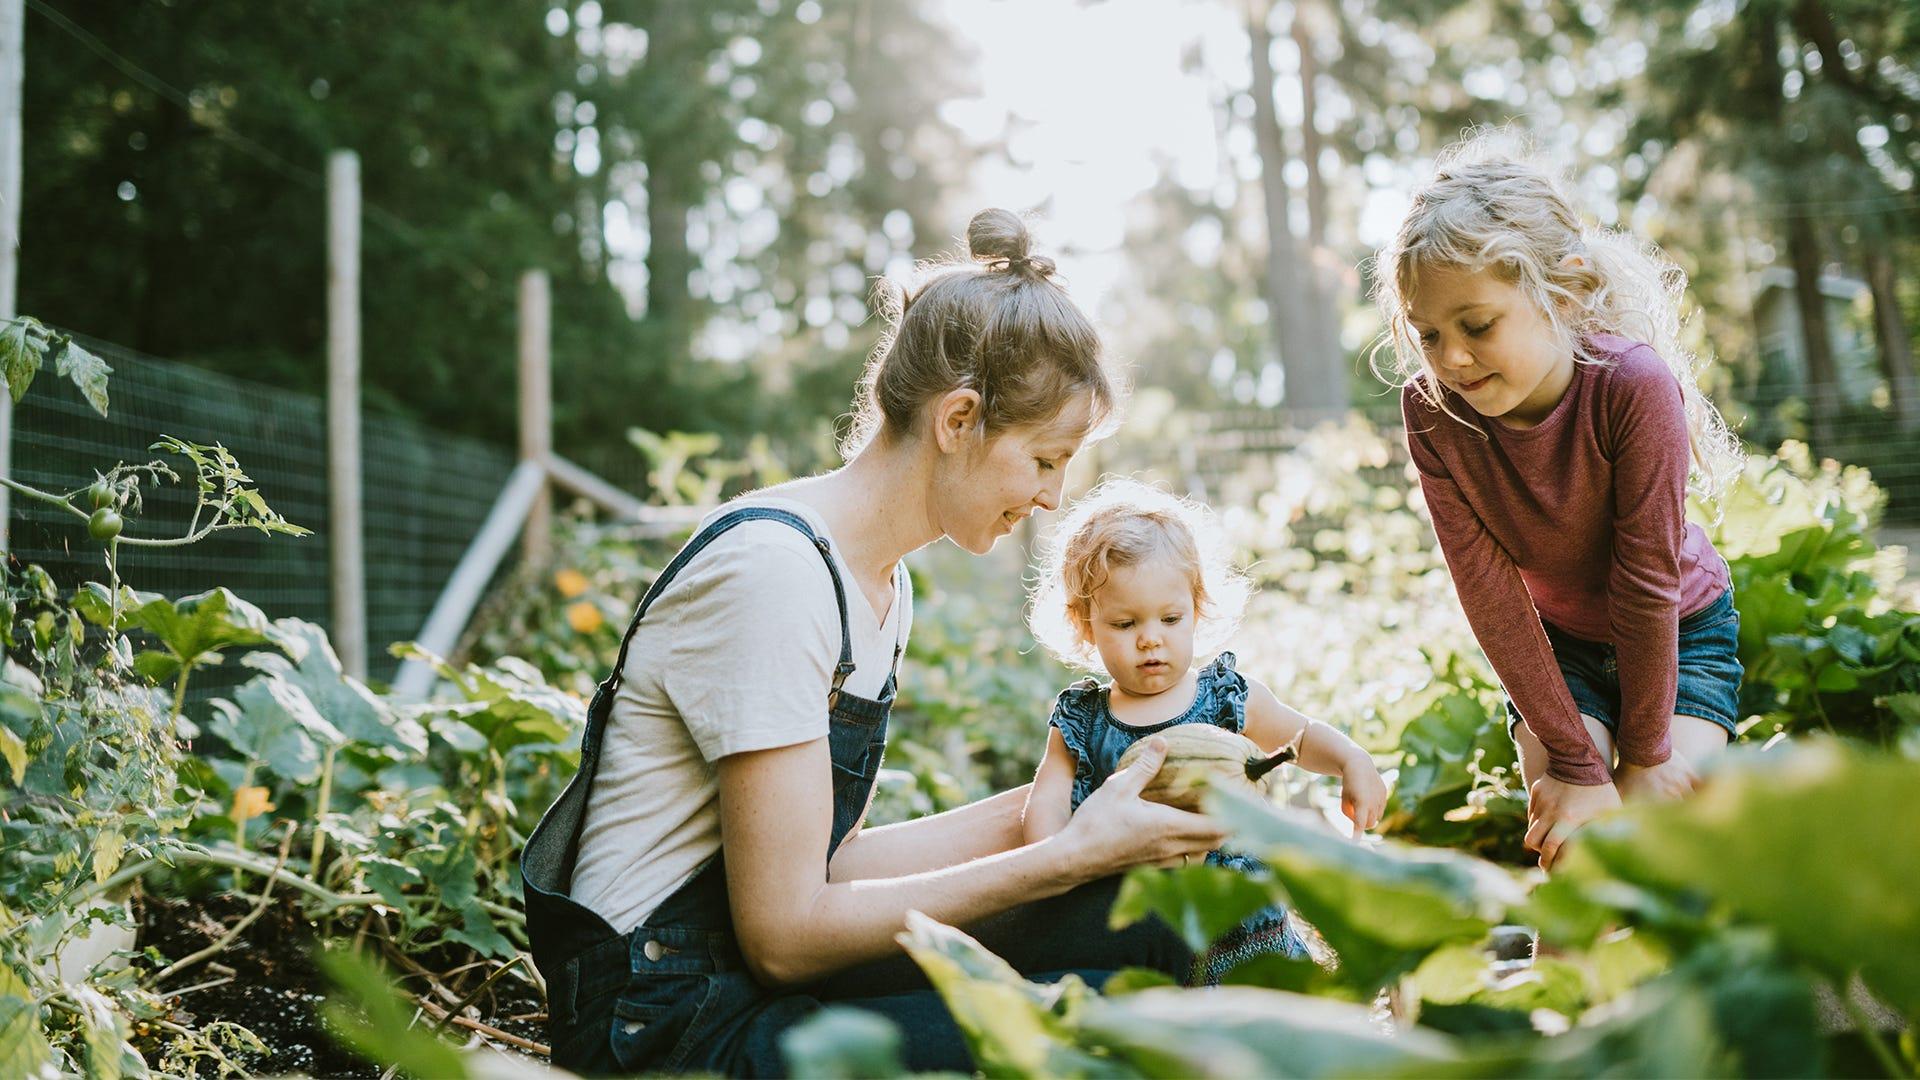 Why Organic: The Benefits of Living Organic